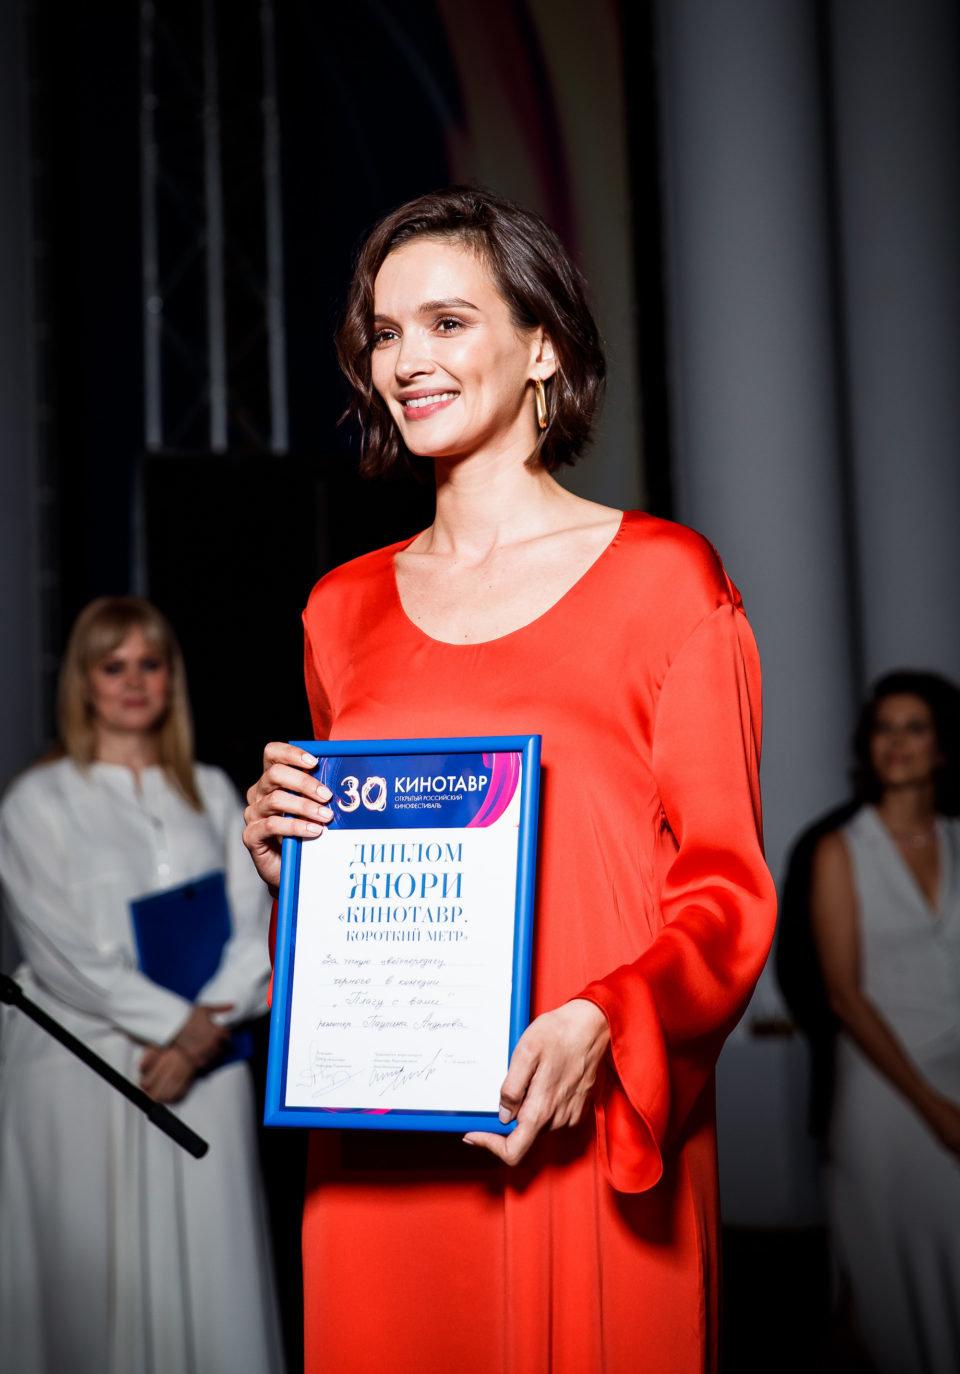 «Кинотавр» 2019: Паулина Андреева получила приз за режиссерский дебют, фото-1